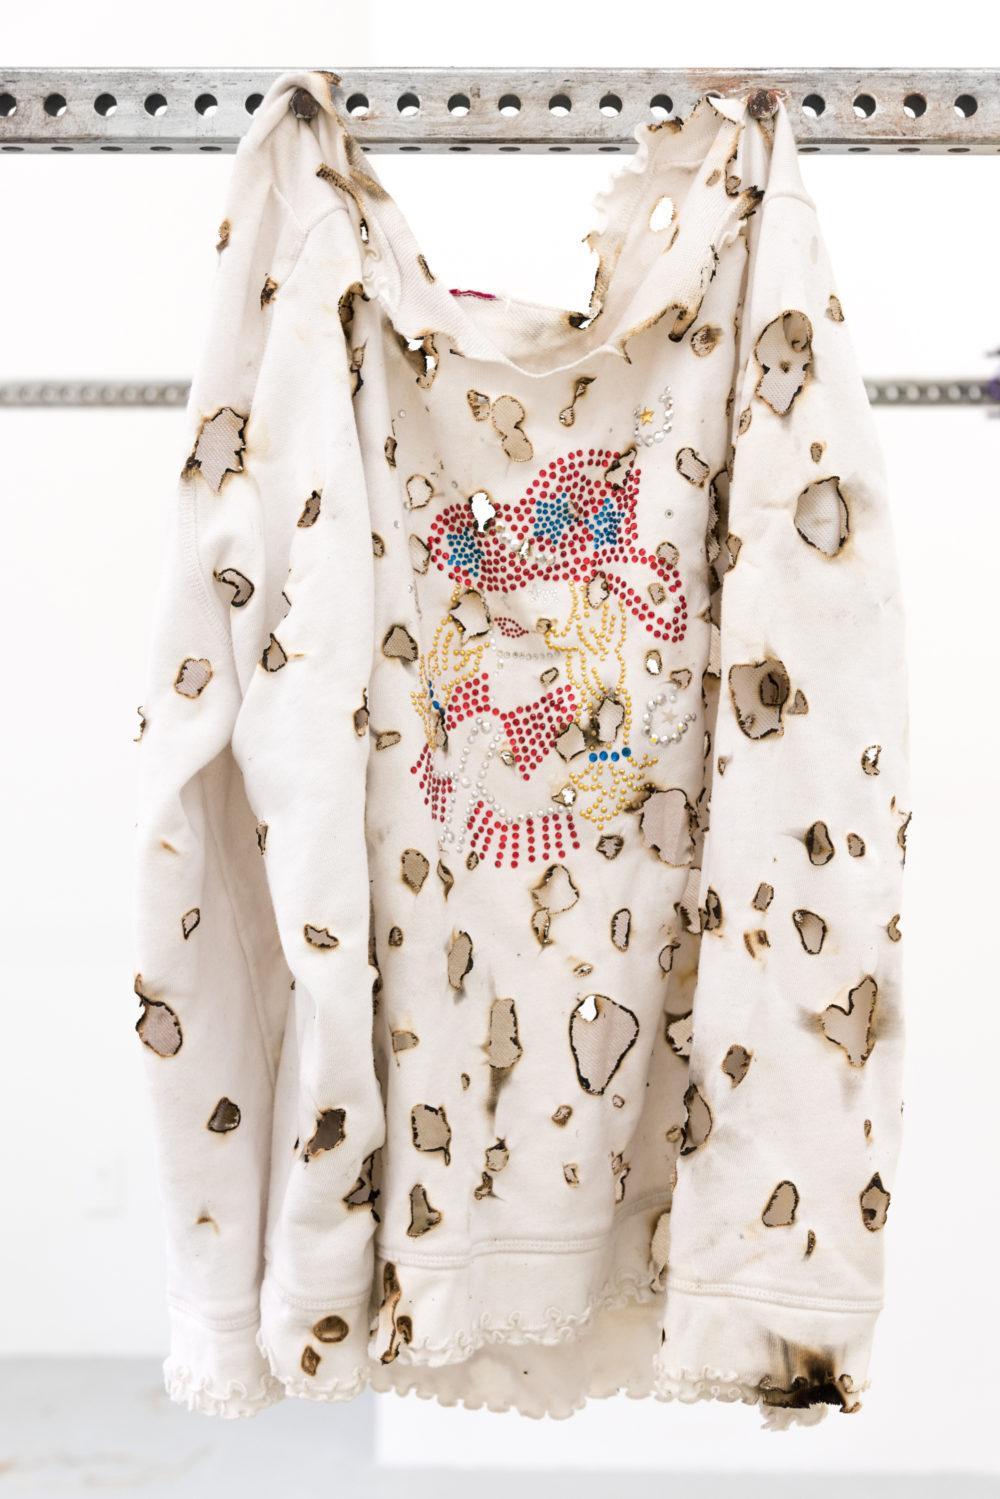 Gunnar Tchida Untitled, 2016 Bedazzled sweatshirt